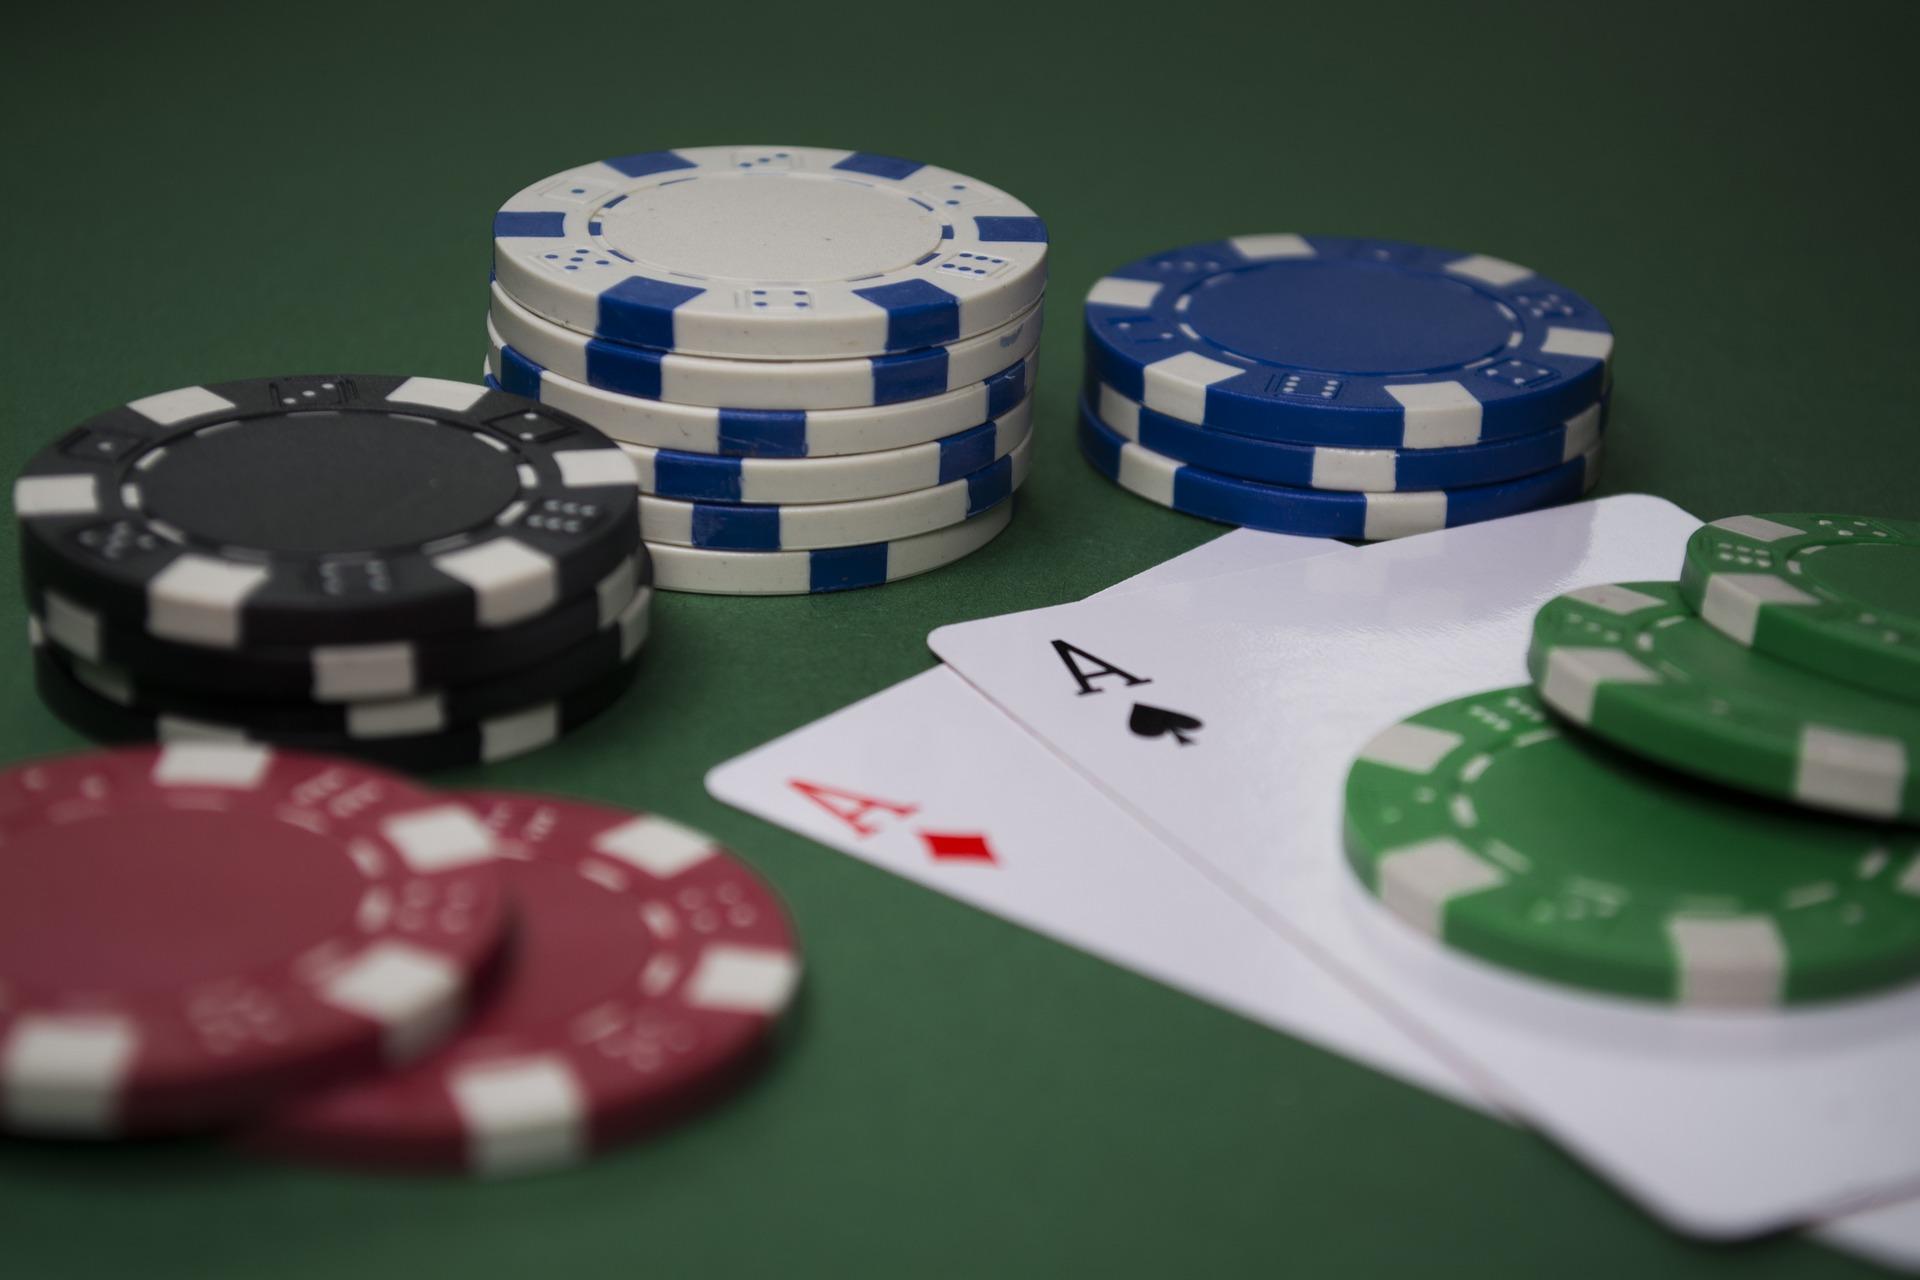 Play Bitcoin Blackjack